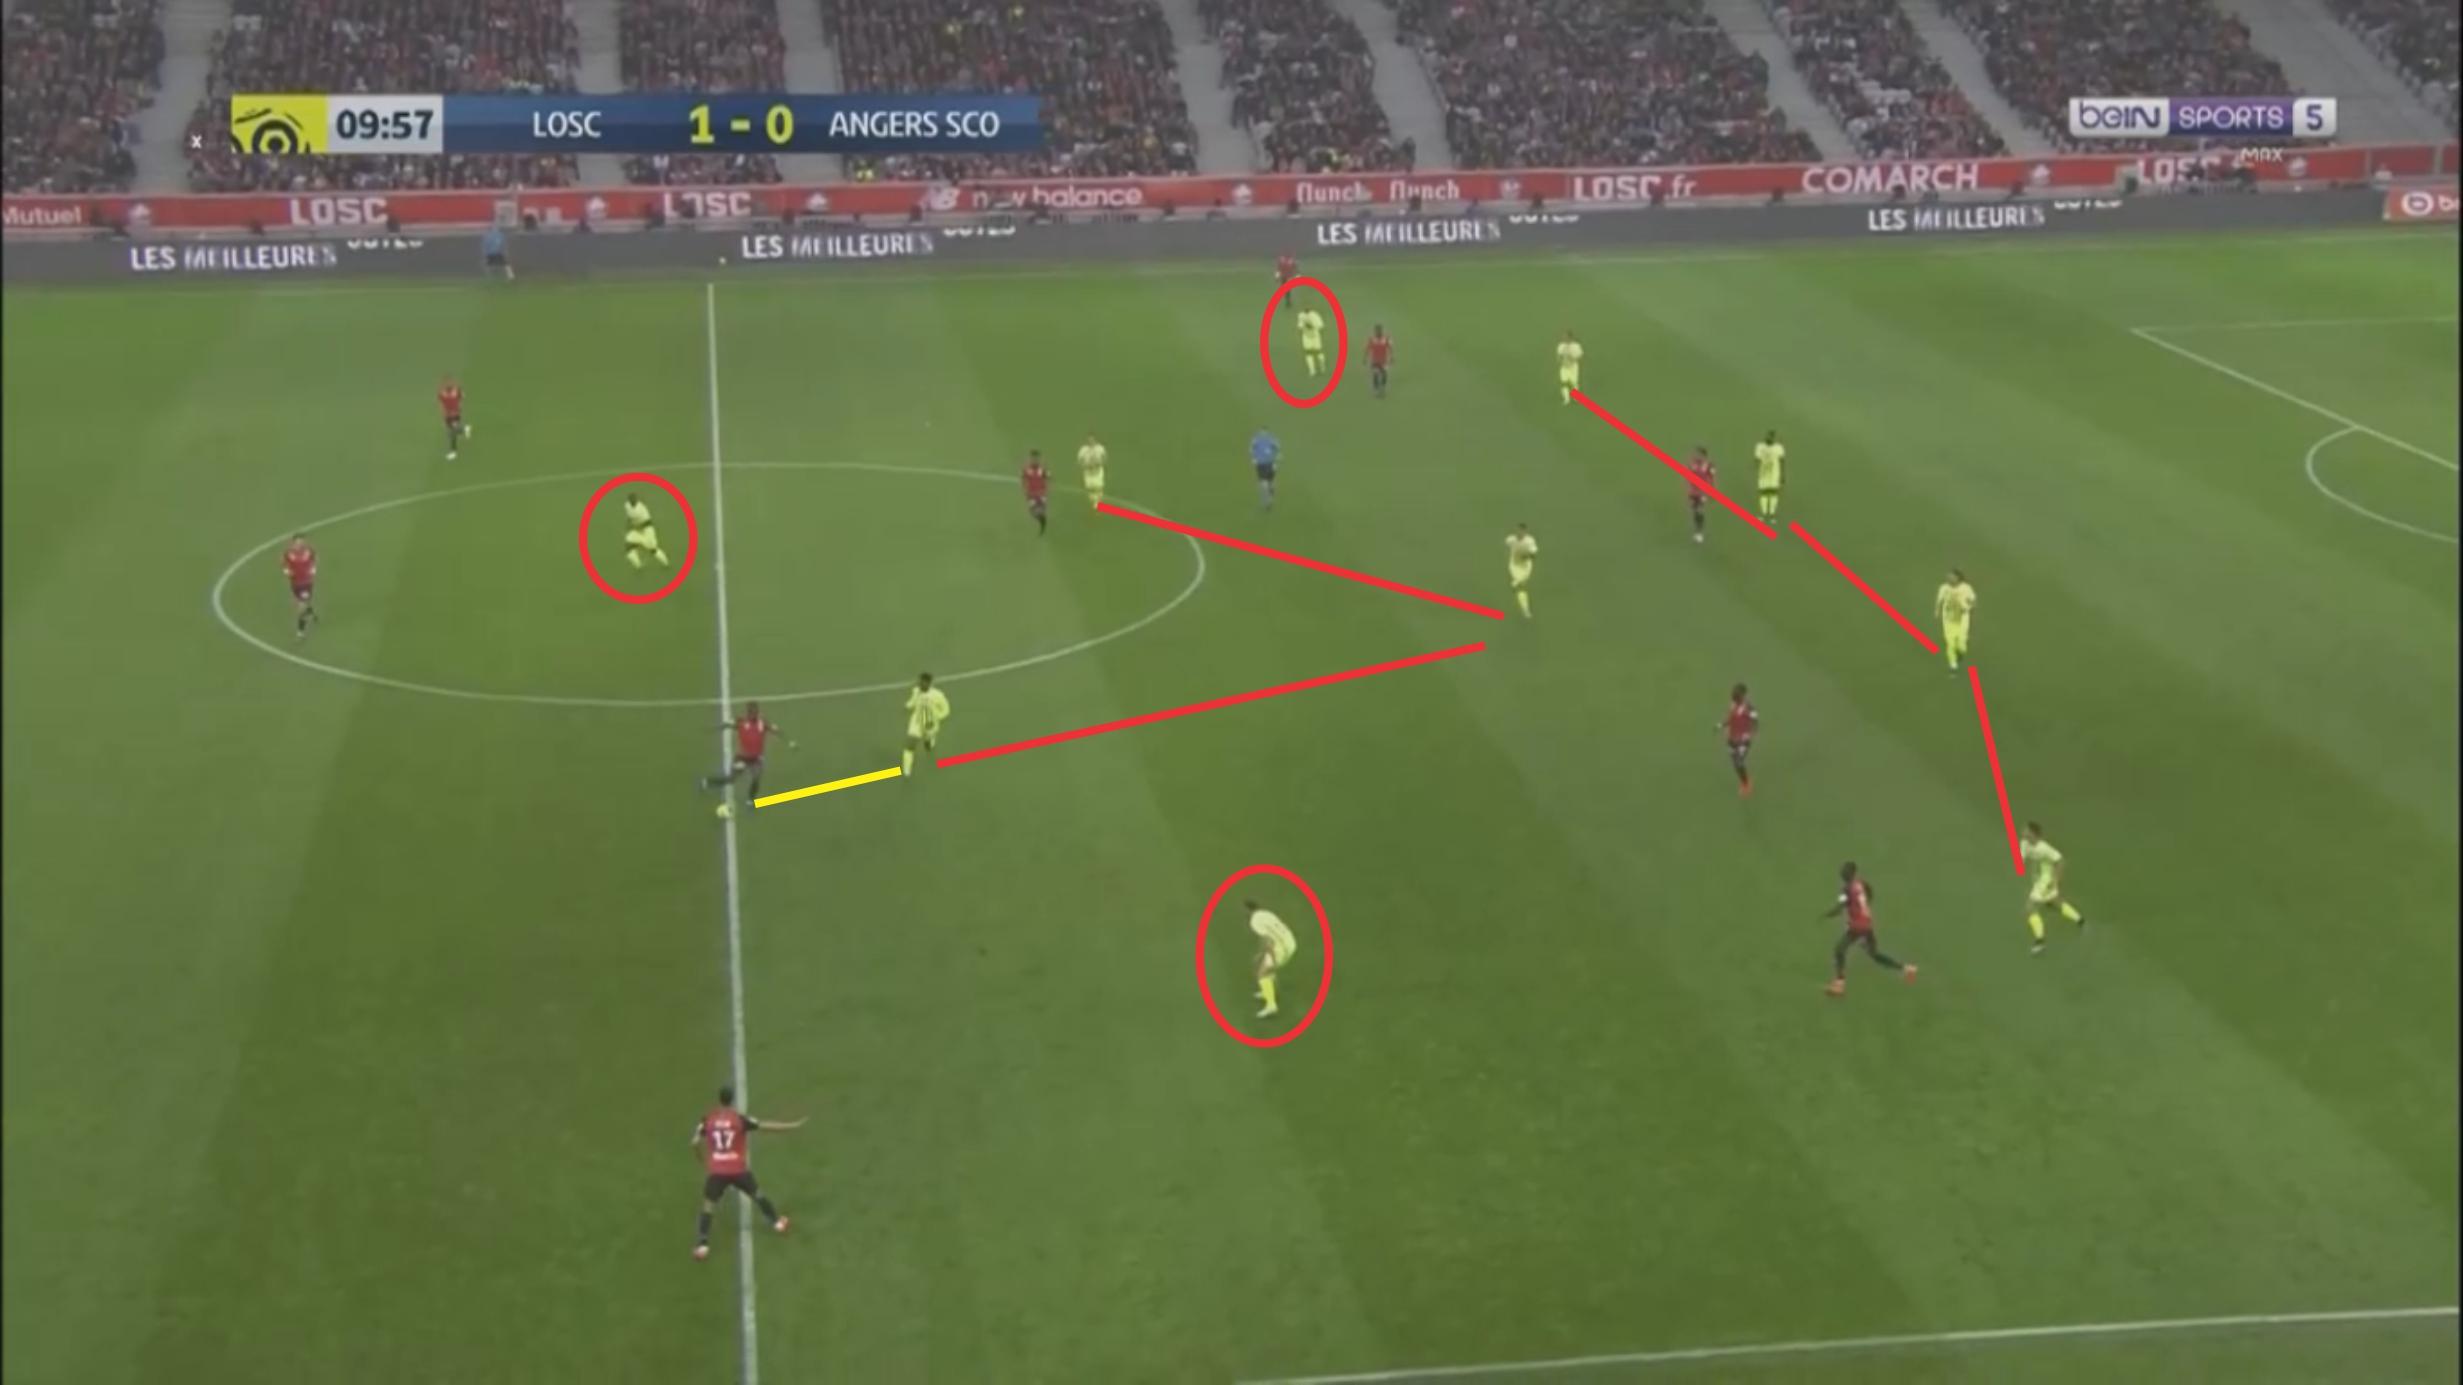 Julien Masson 2018/19 - scout report - tactical analysis - tactics